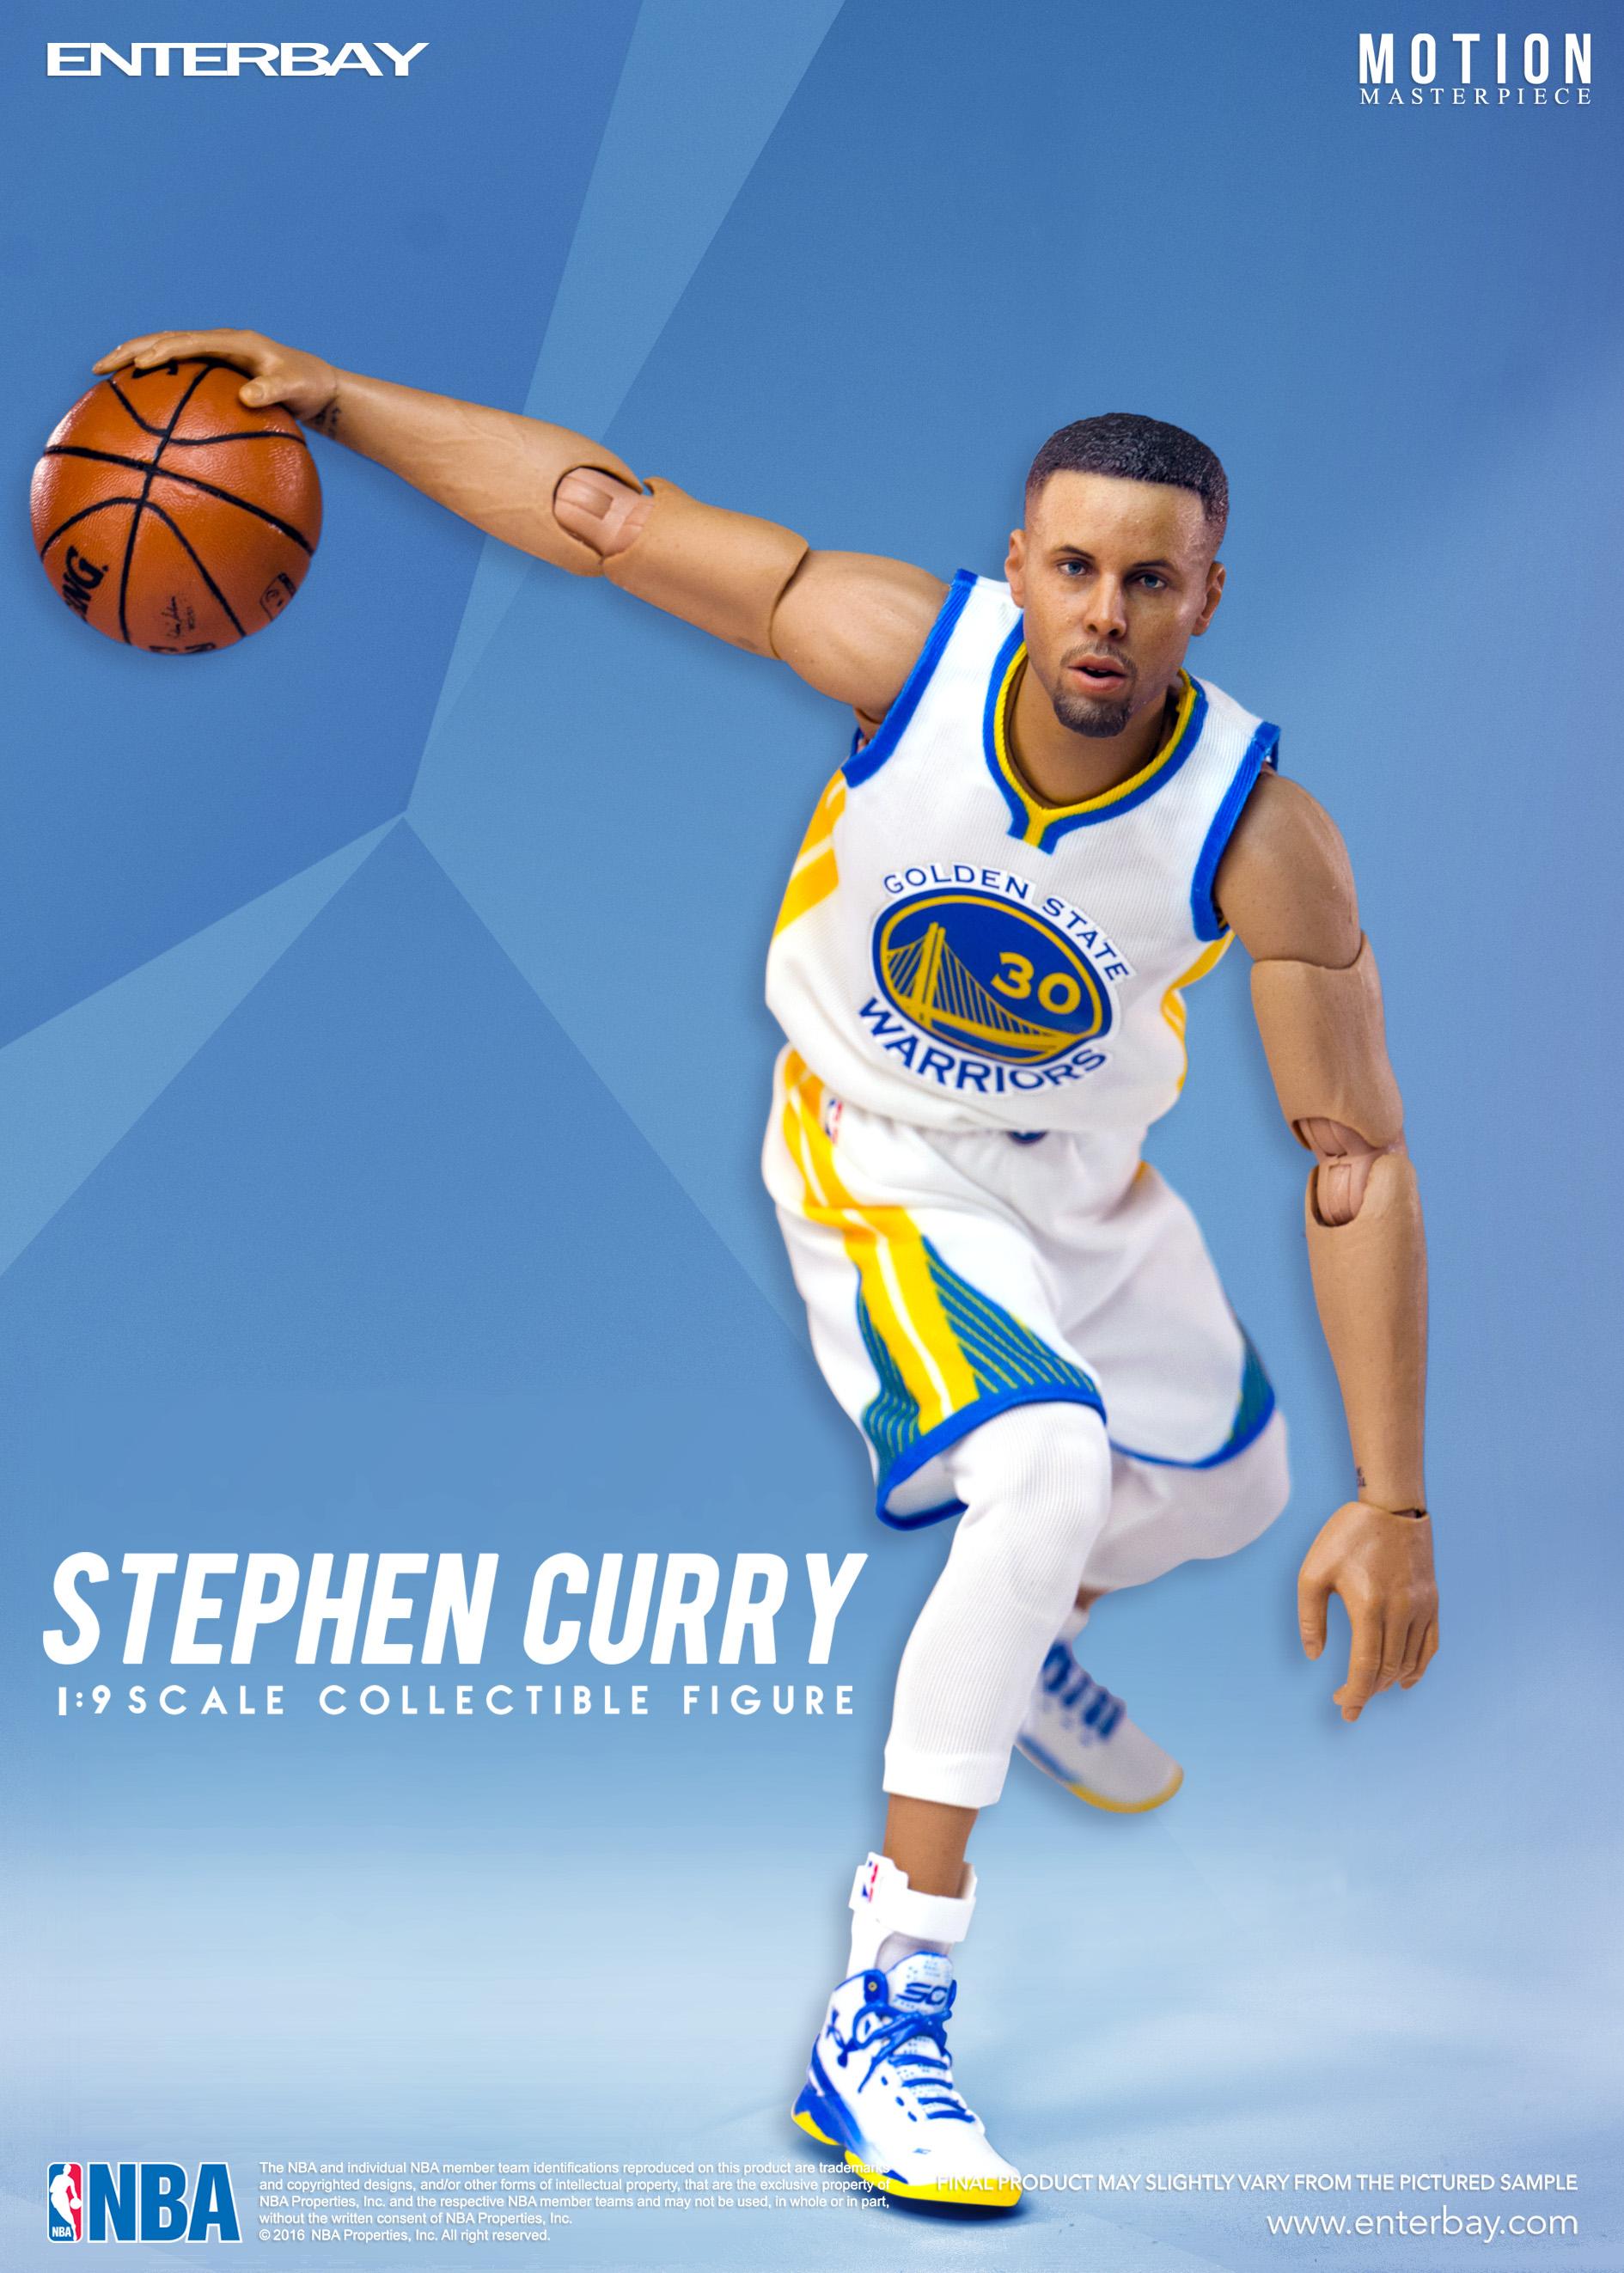 Golden State Warriors Wallpaper Hd Toy Focus Motion Masterpiece James Harden Stephen Curry